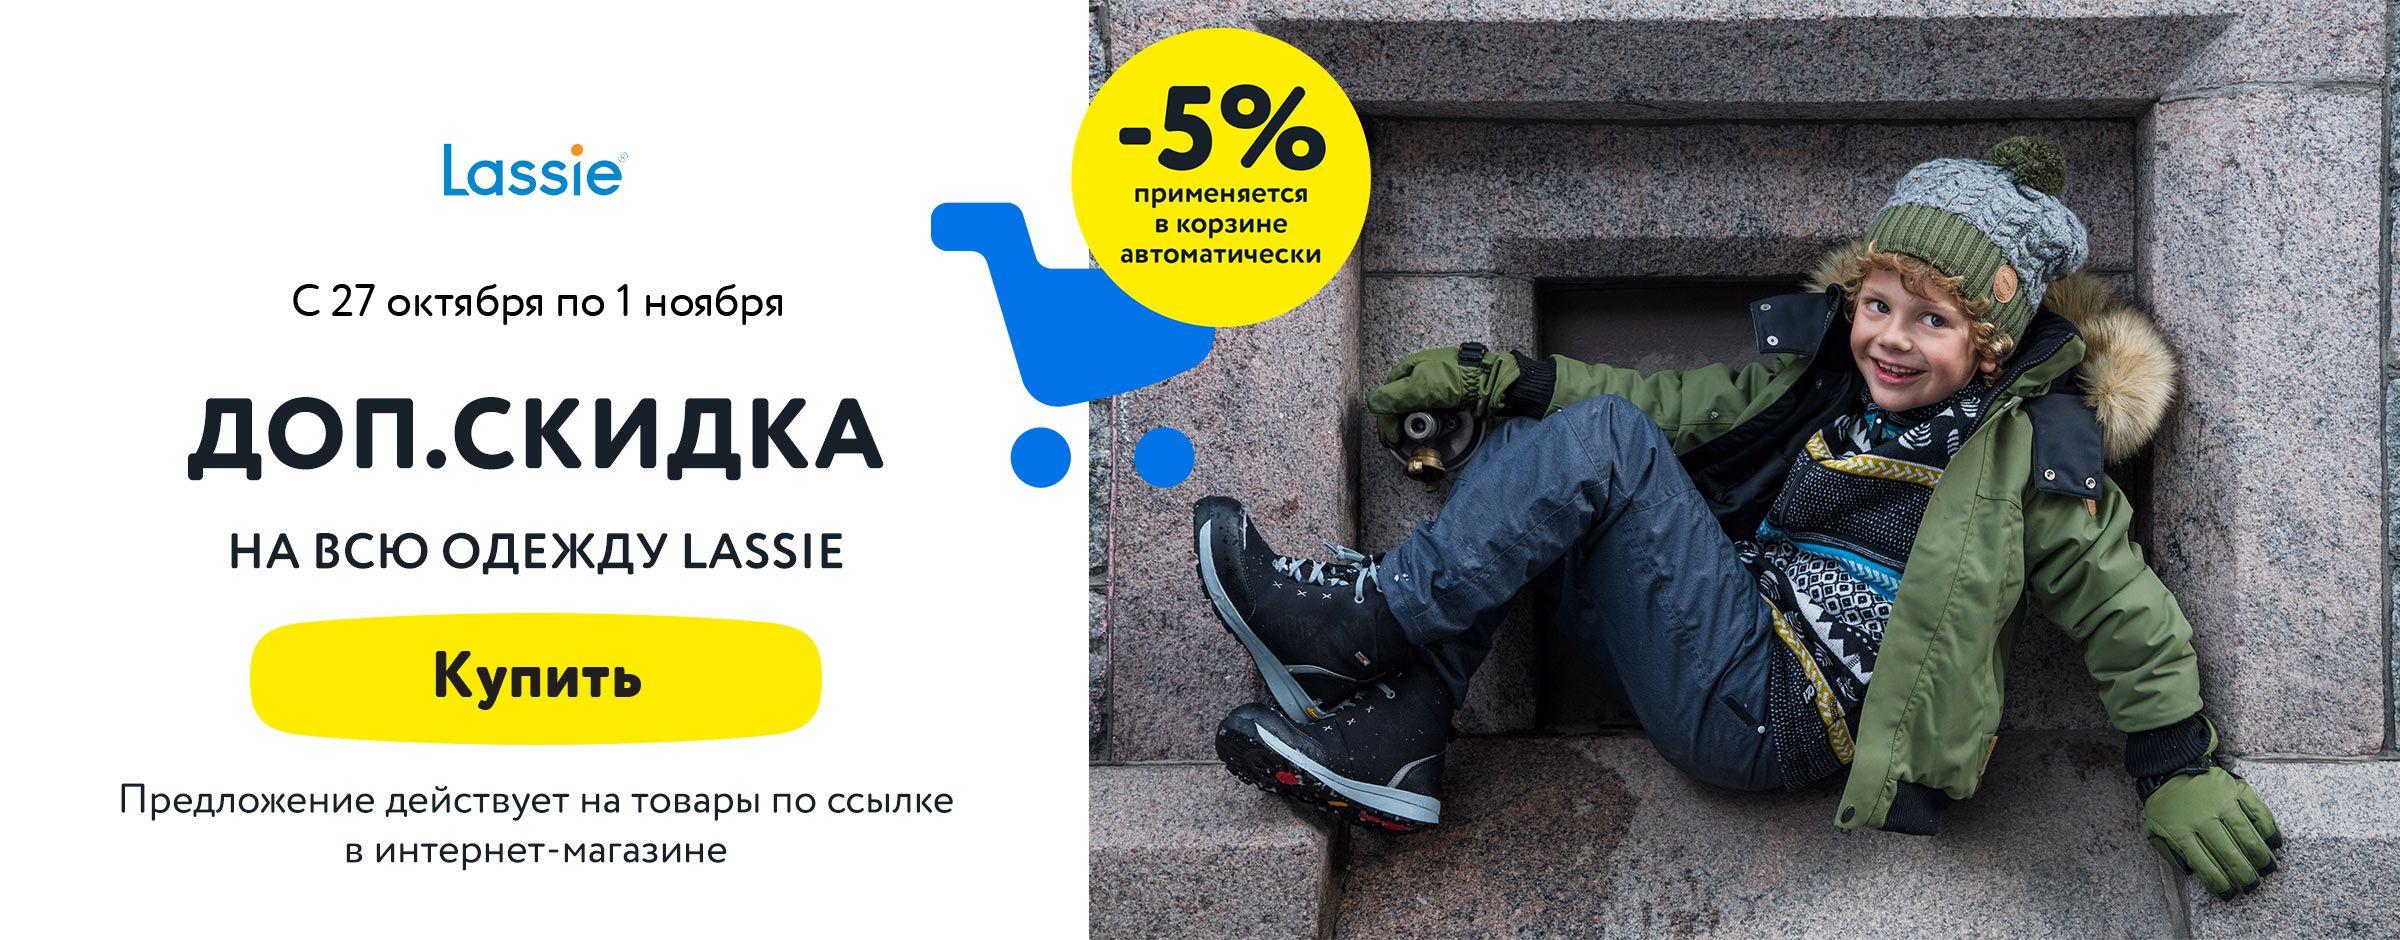 Доп. скидка 5% на бренды Lassie и Reima в корзине